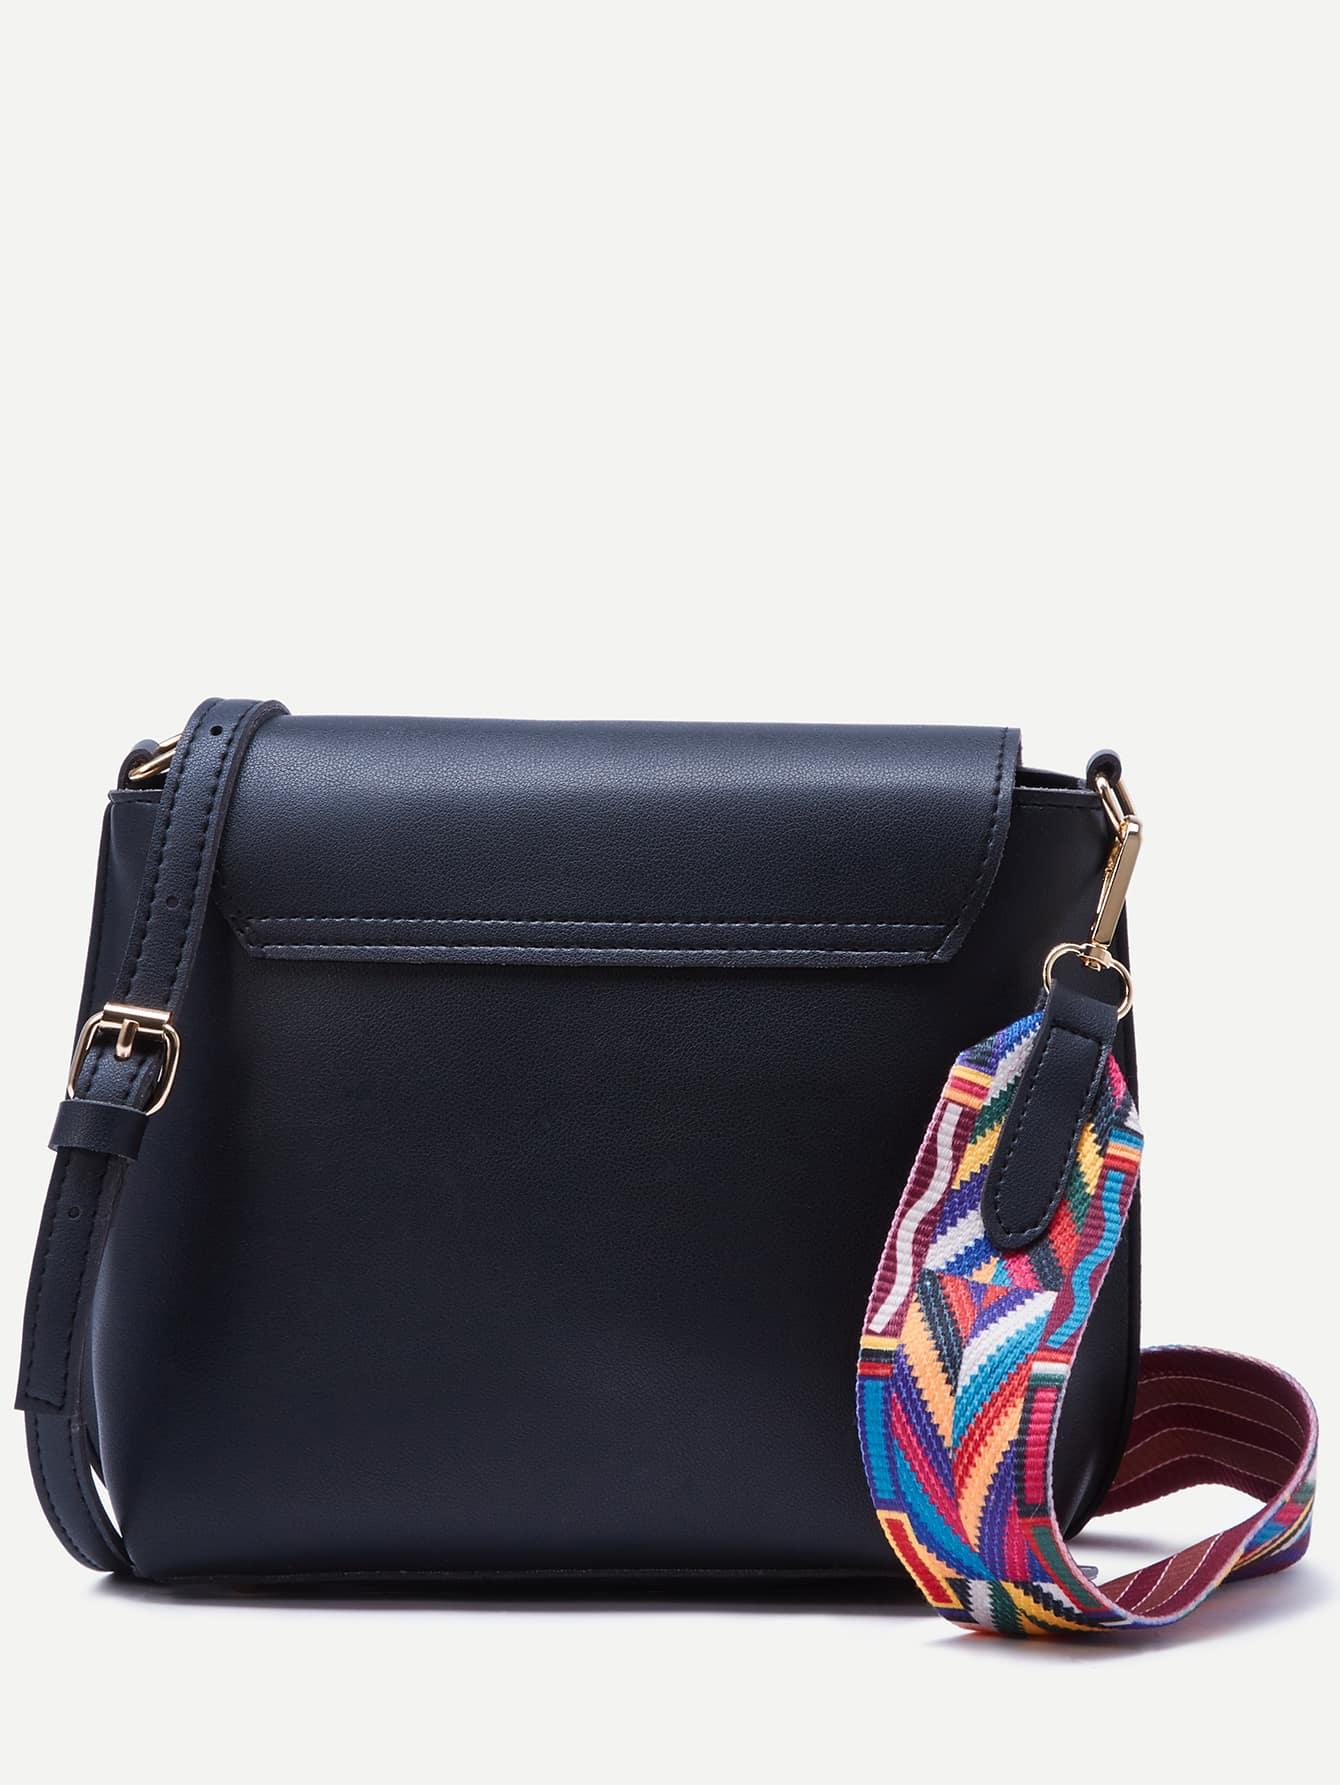 Black Wide Strap PU Flap Shoulder Bag -SheIn(Sheinside)